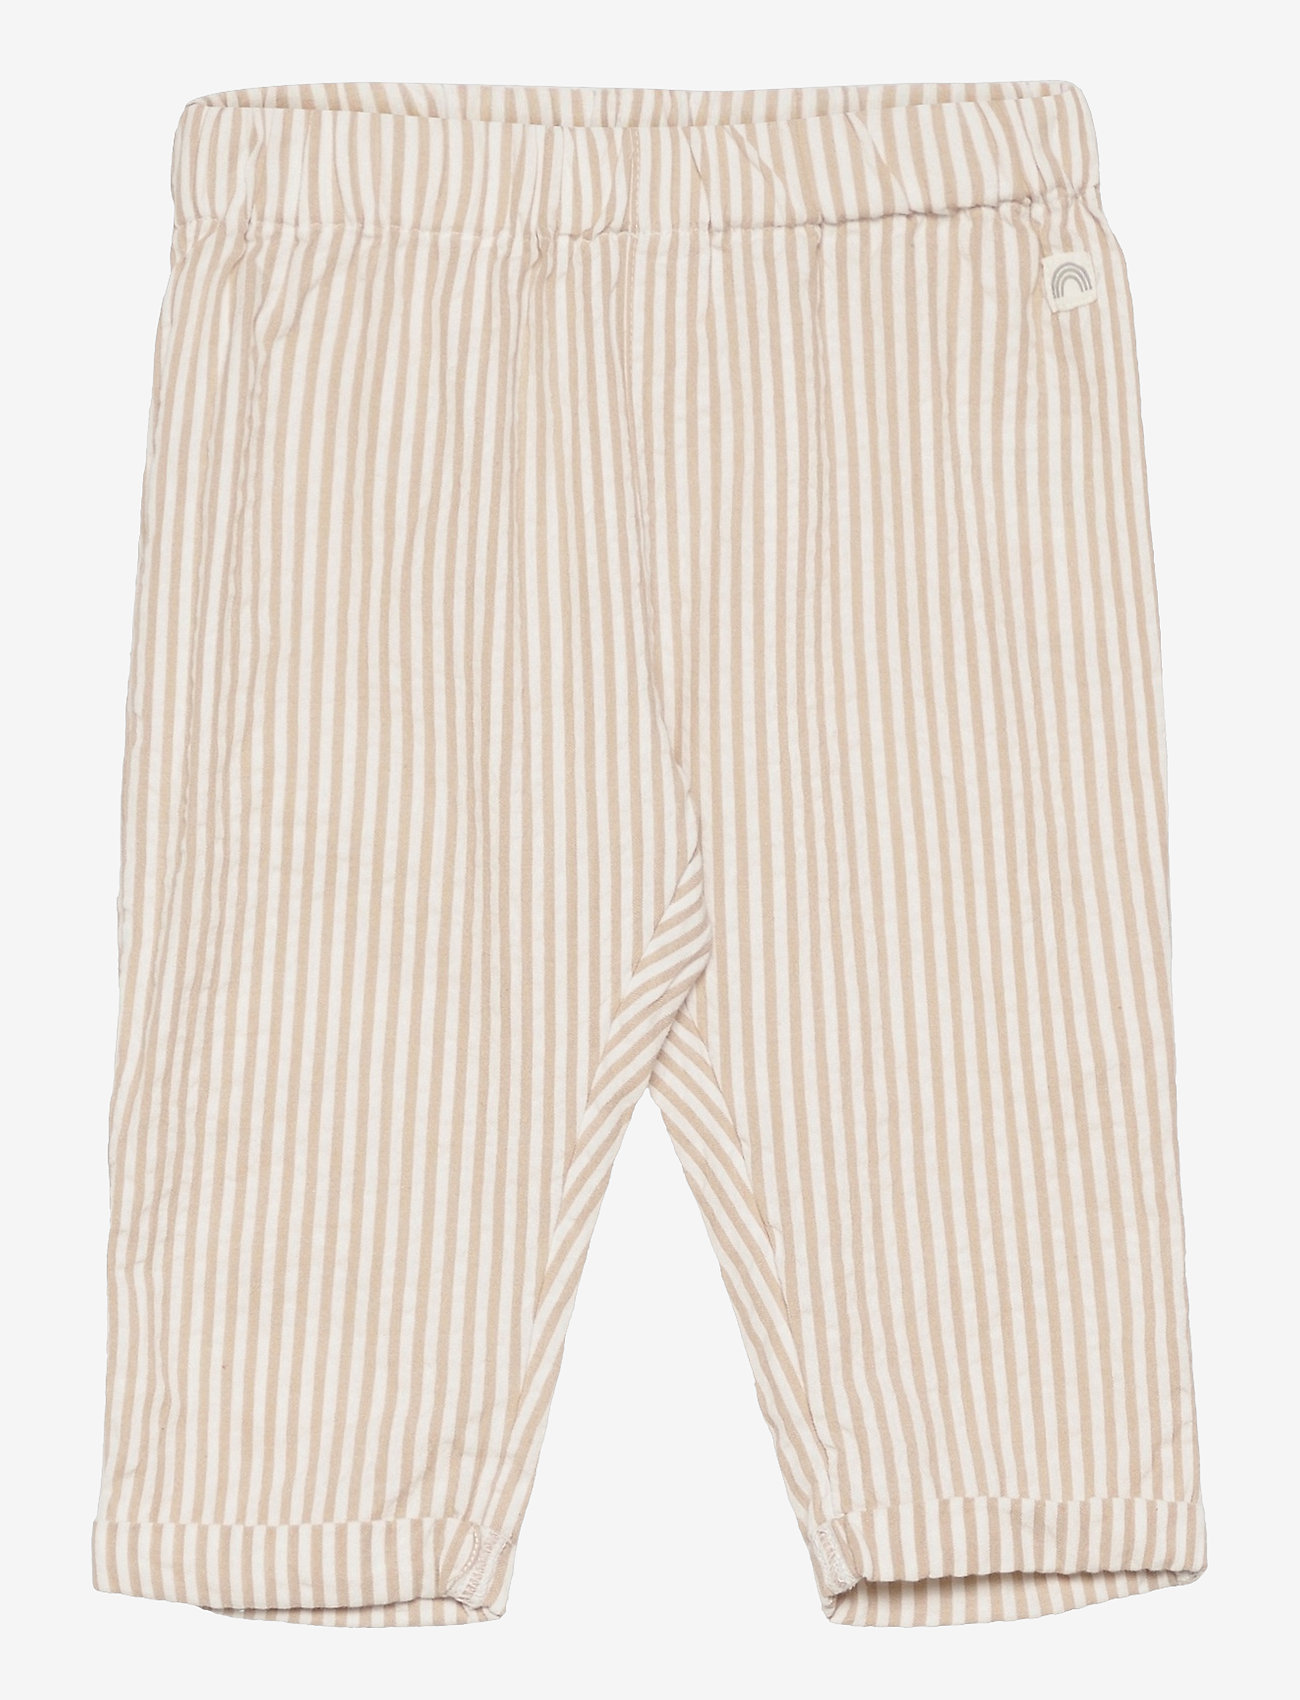 Lindex - Trouser woven seersucker - trousers - beige - 0